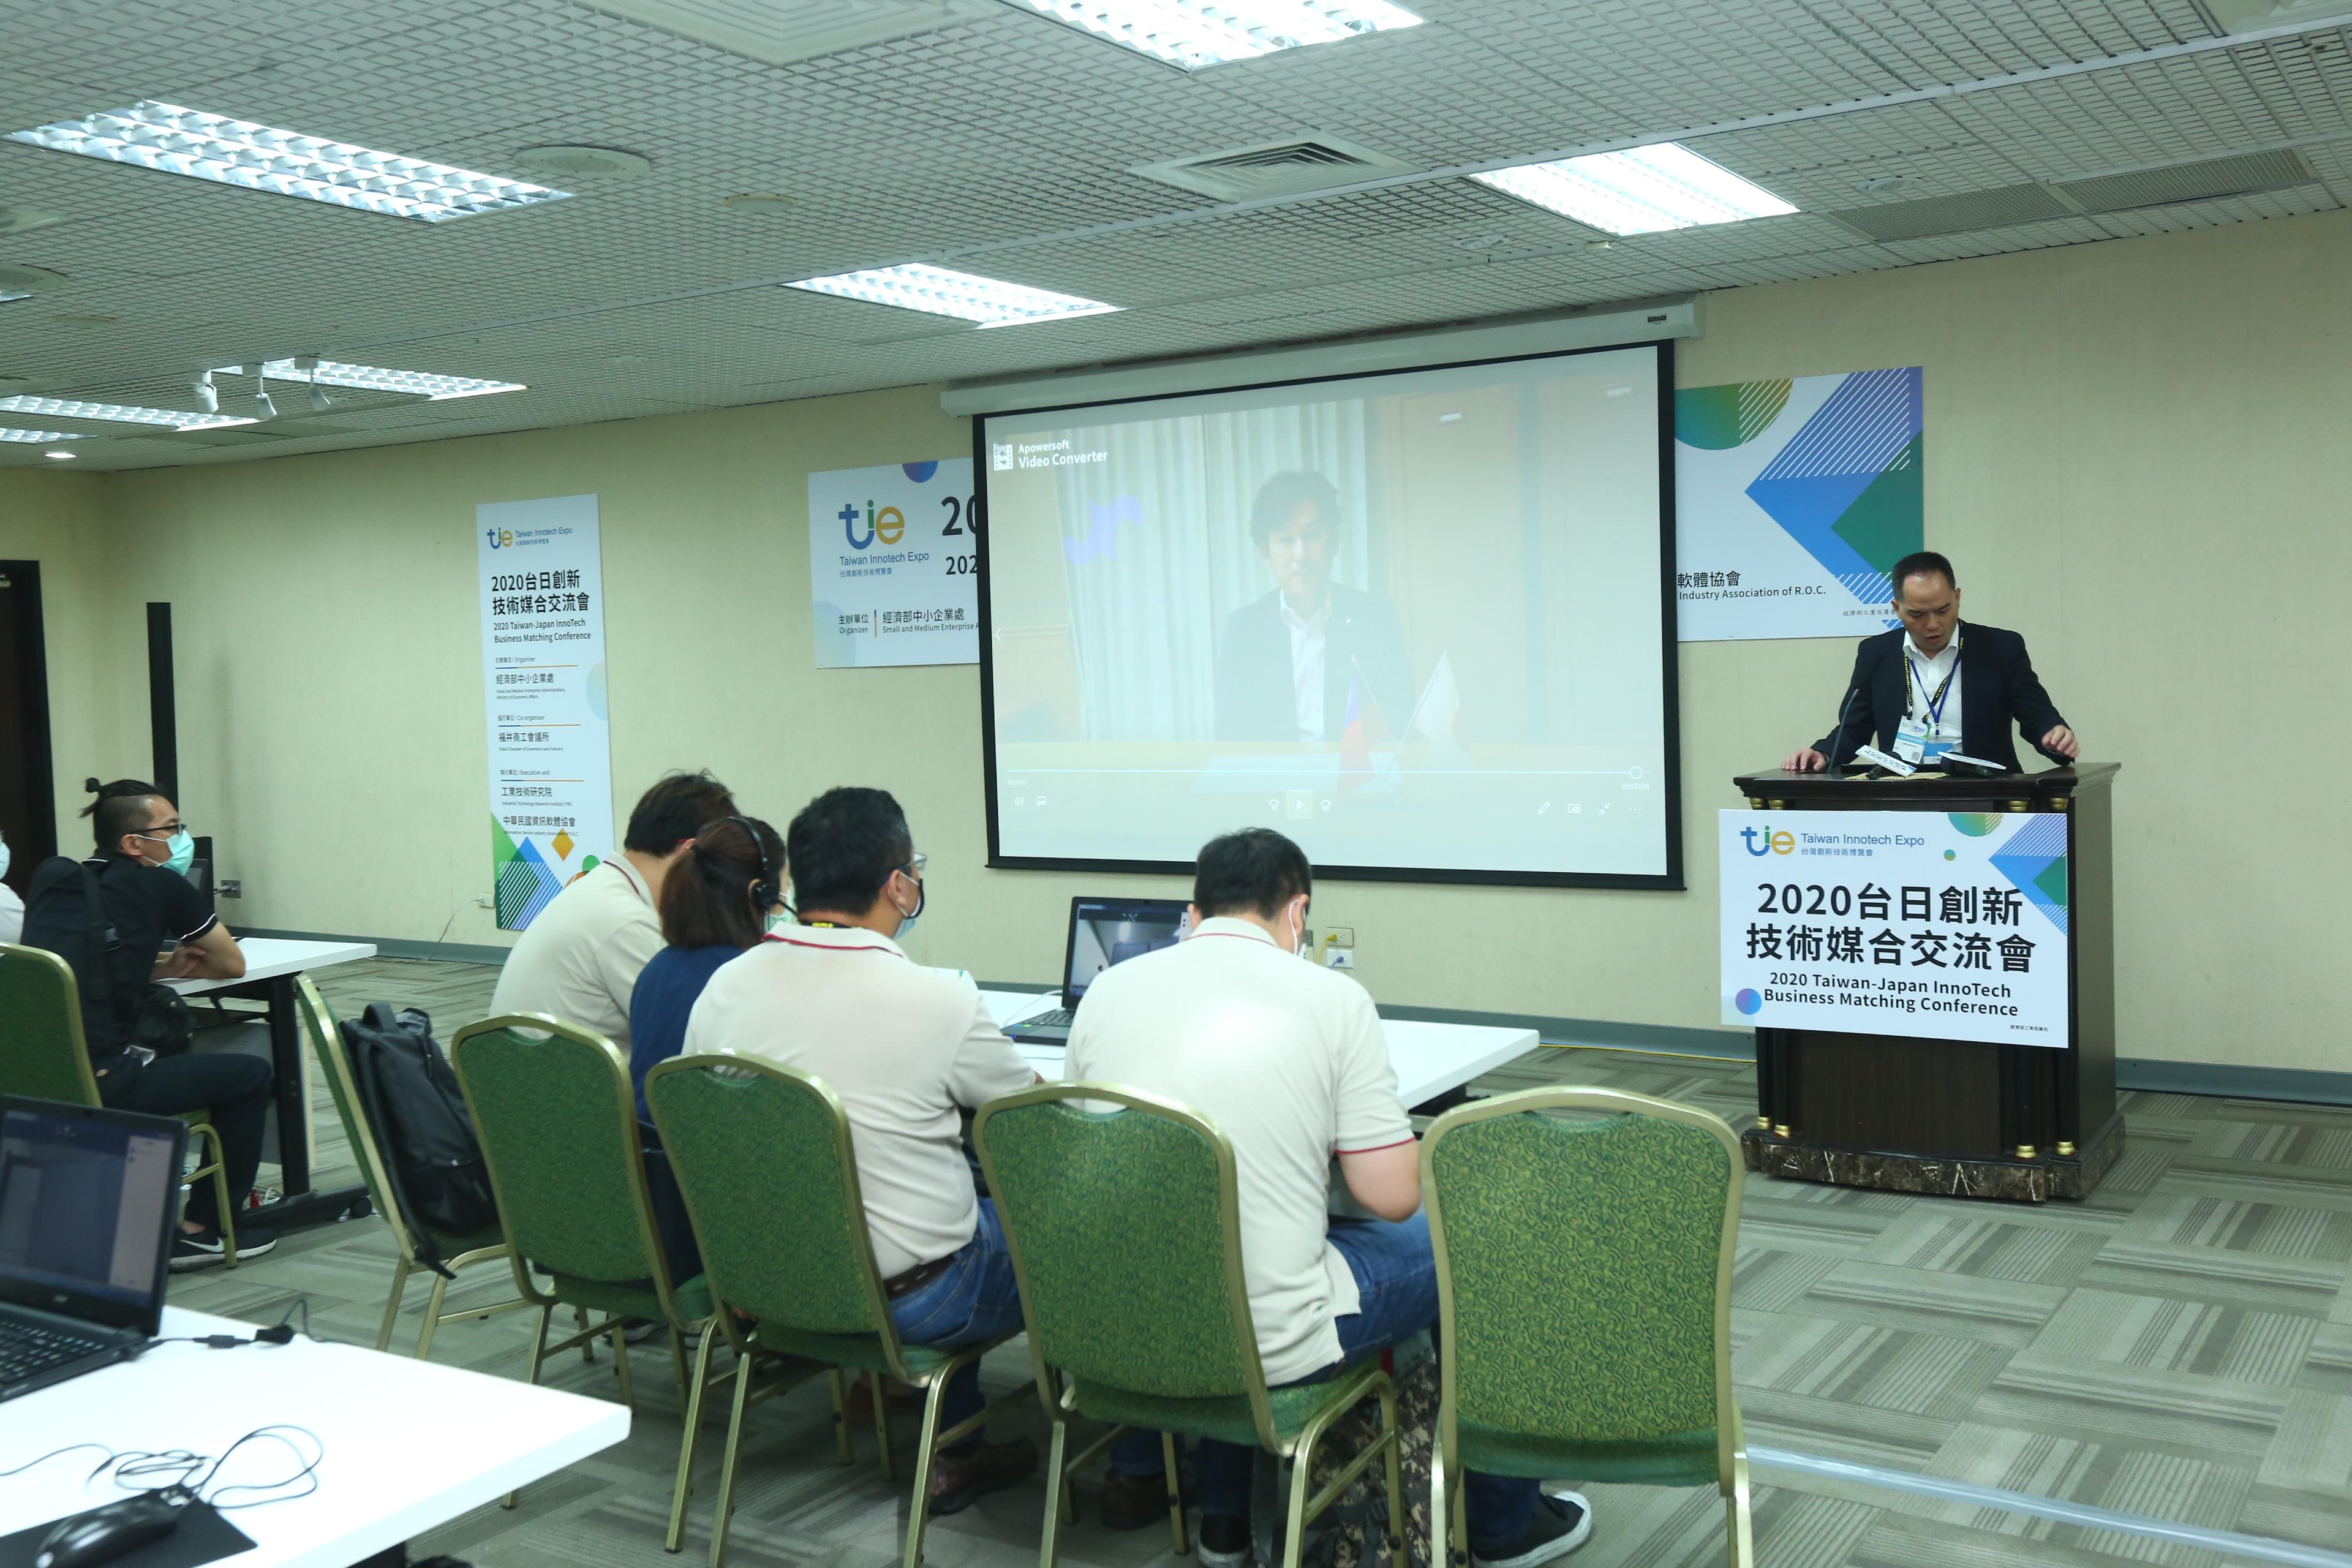 https://storage.googleapis.com/www.taiwantradeshow.com.tw/activity-photo/202009/T-11128196-name.jpg